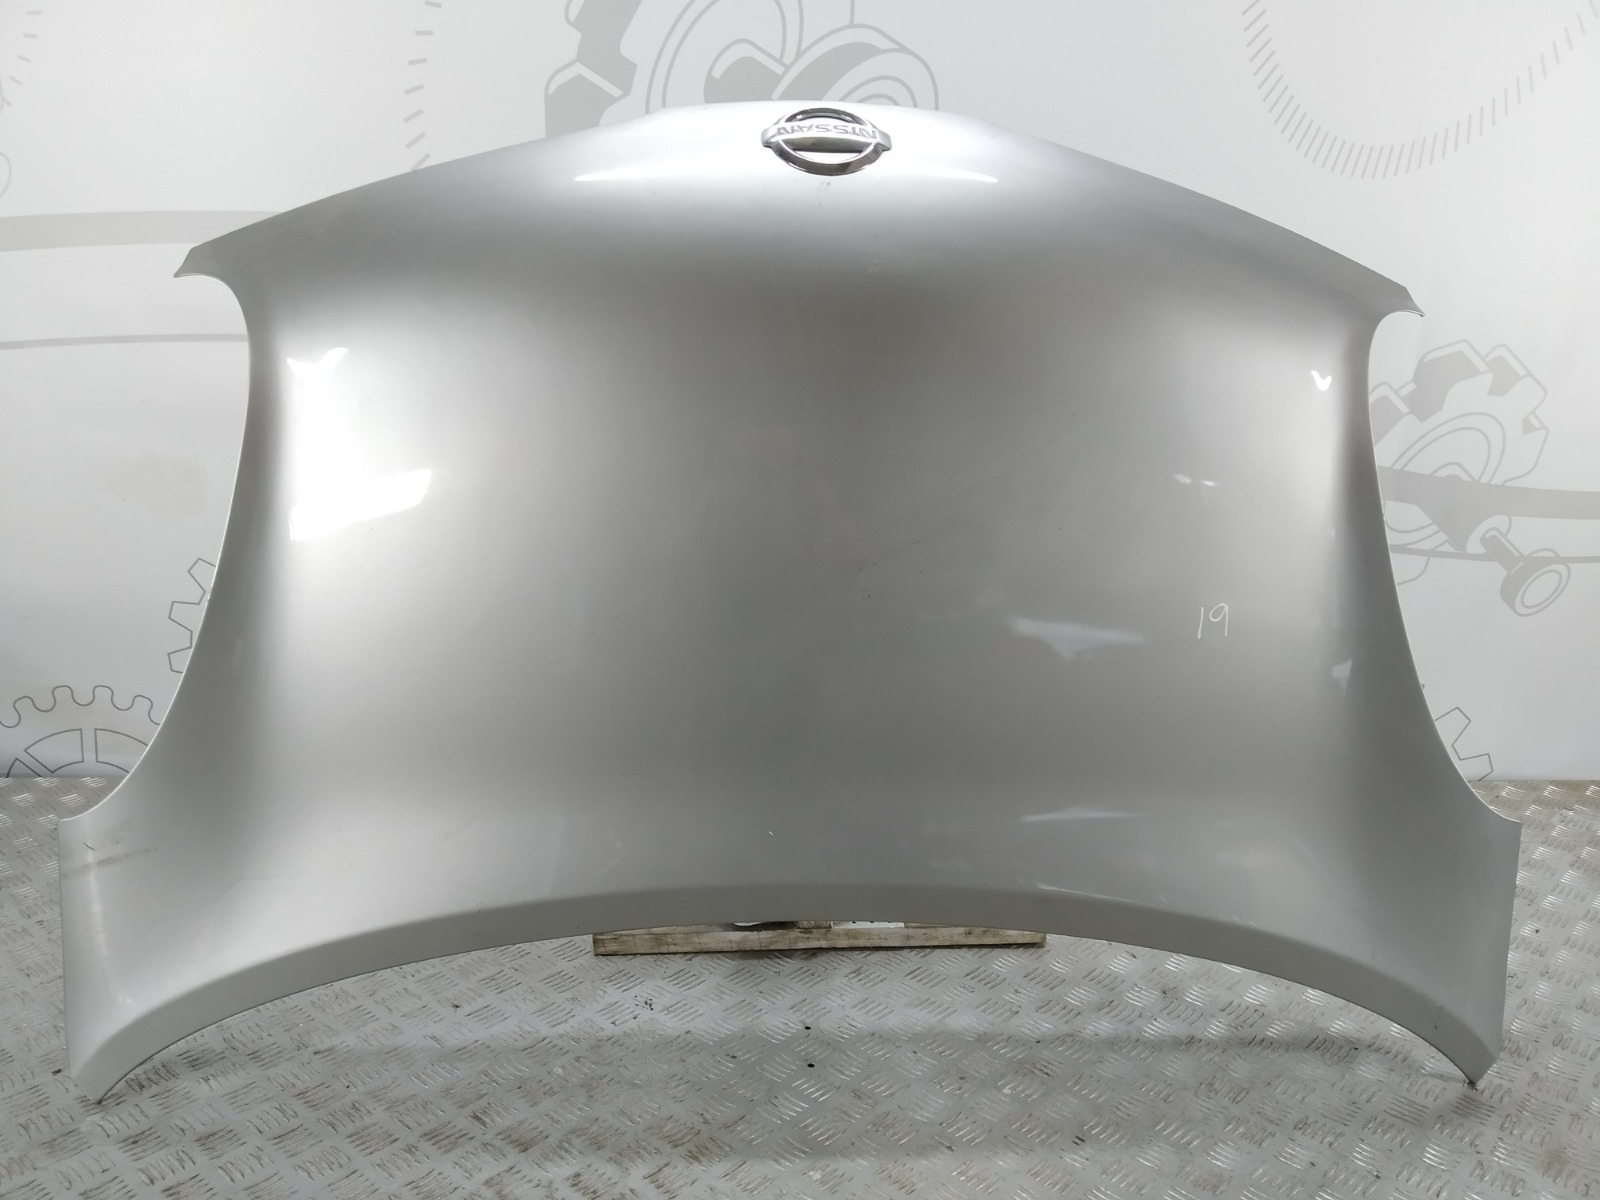 Капот Nissan Micra K12 1.2 I 2005 (б/у)